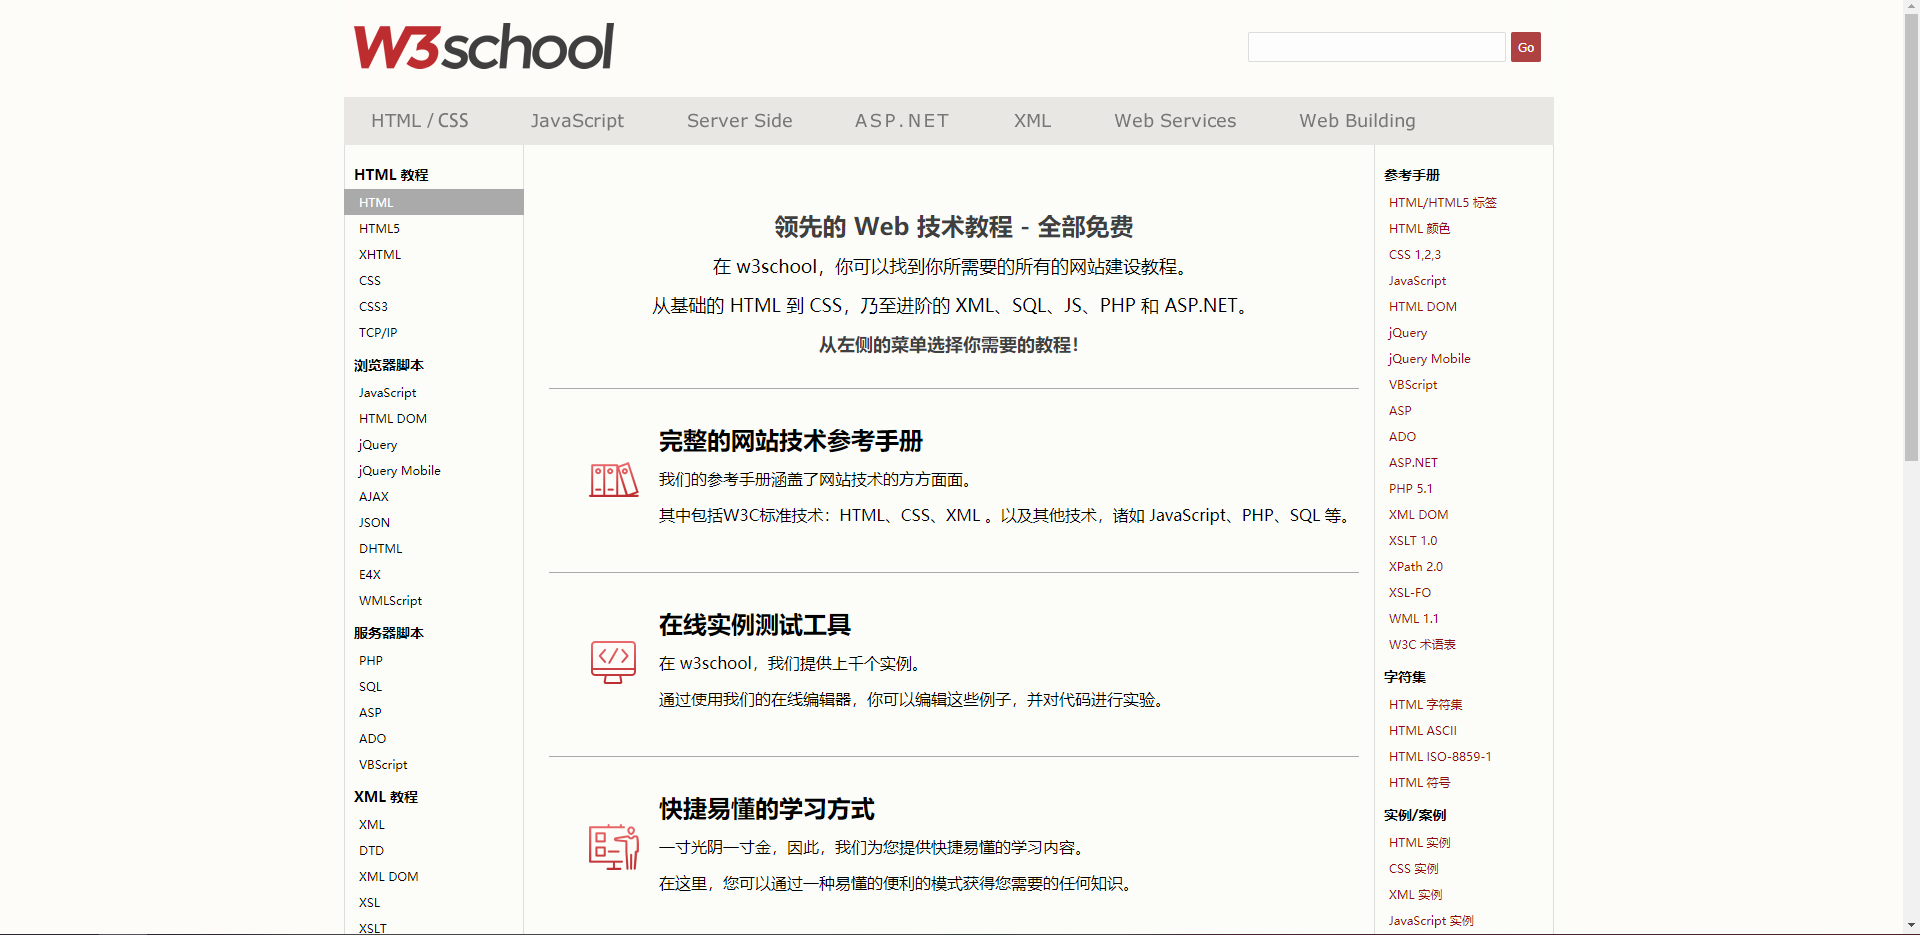 W3school整站html源码下载